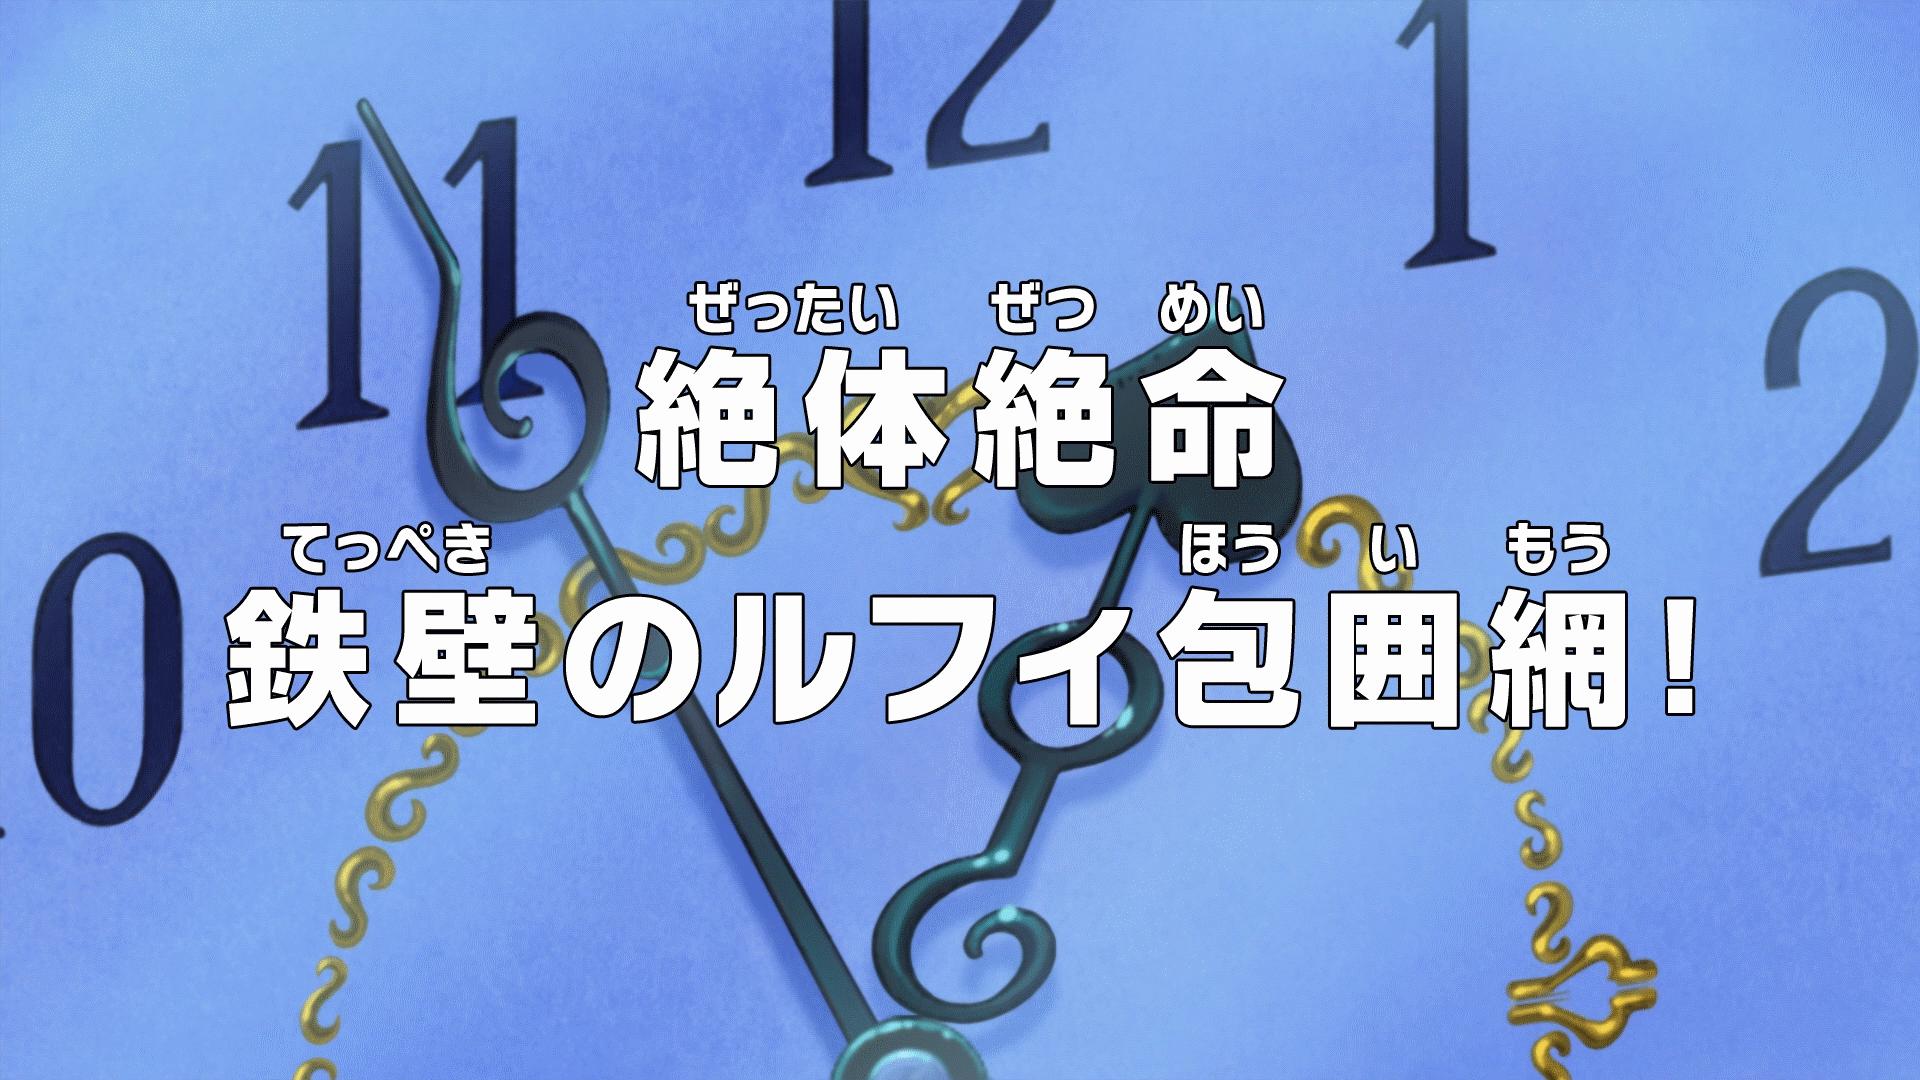 Episode 872